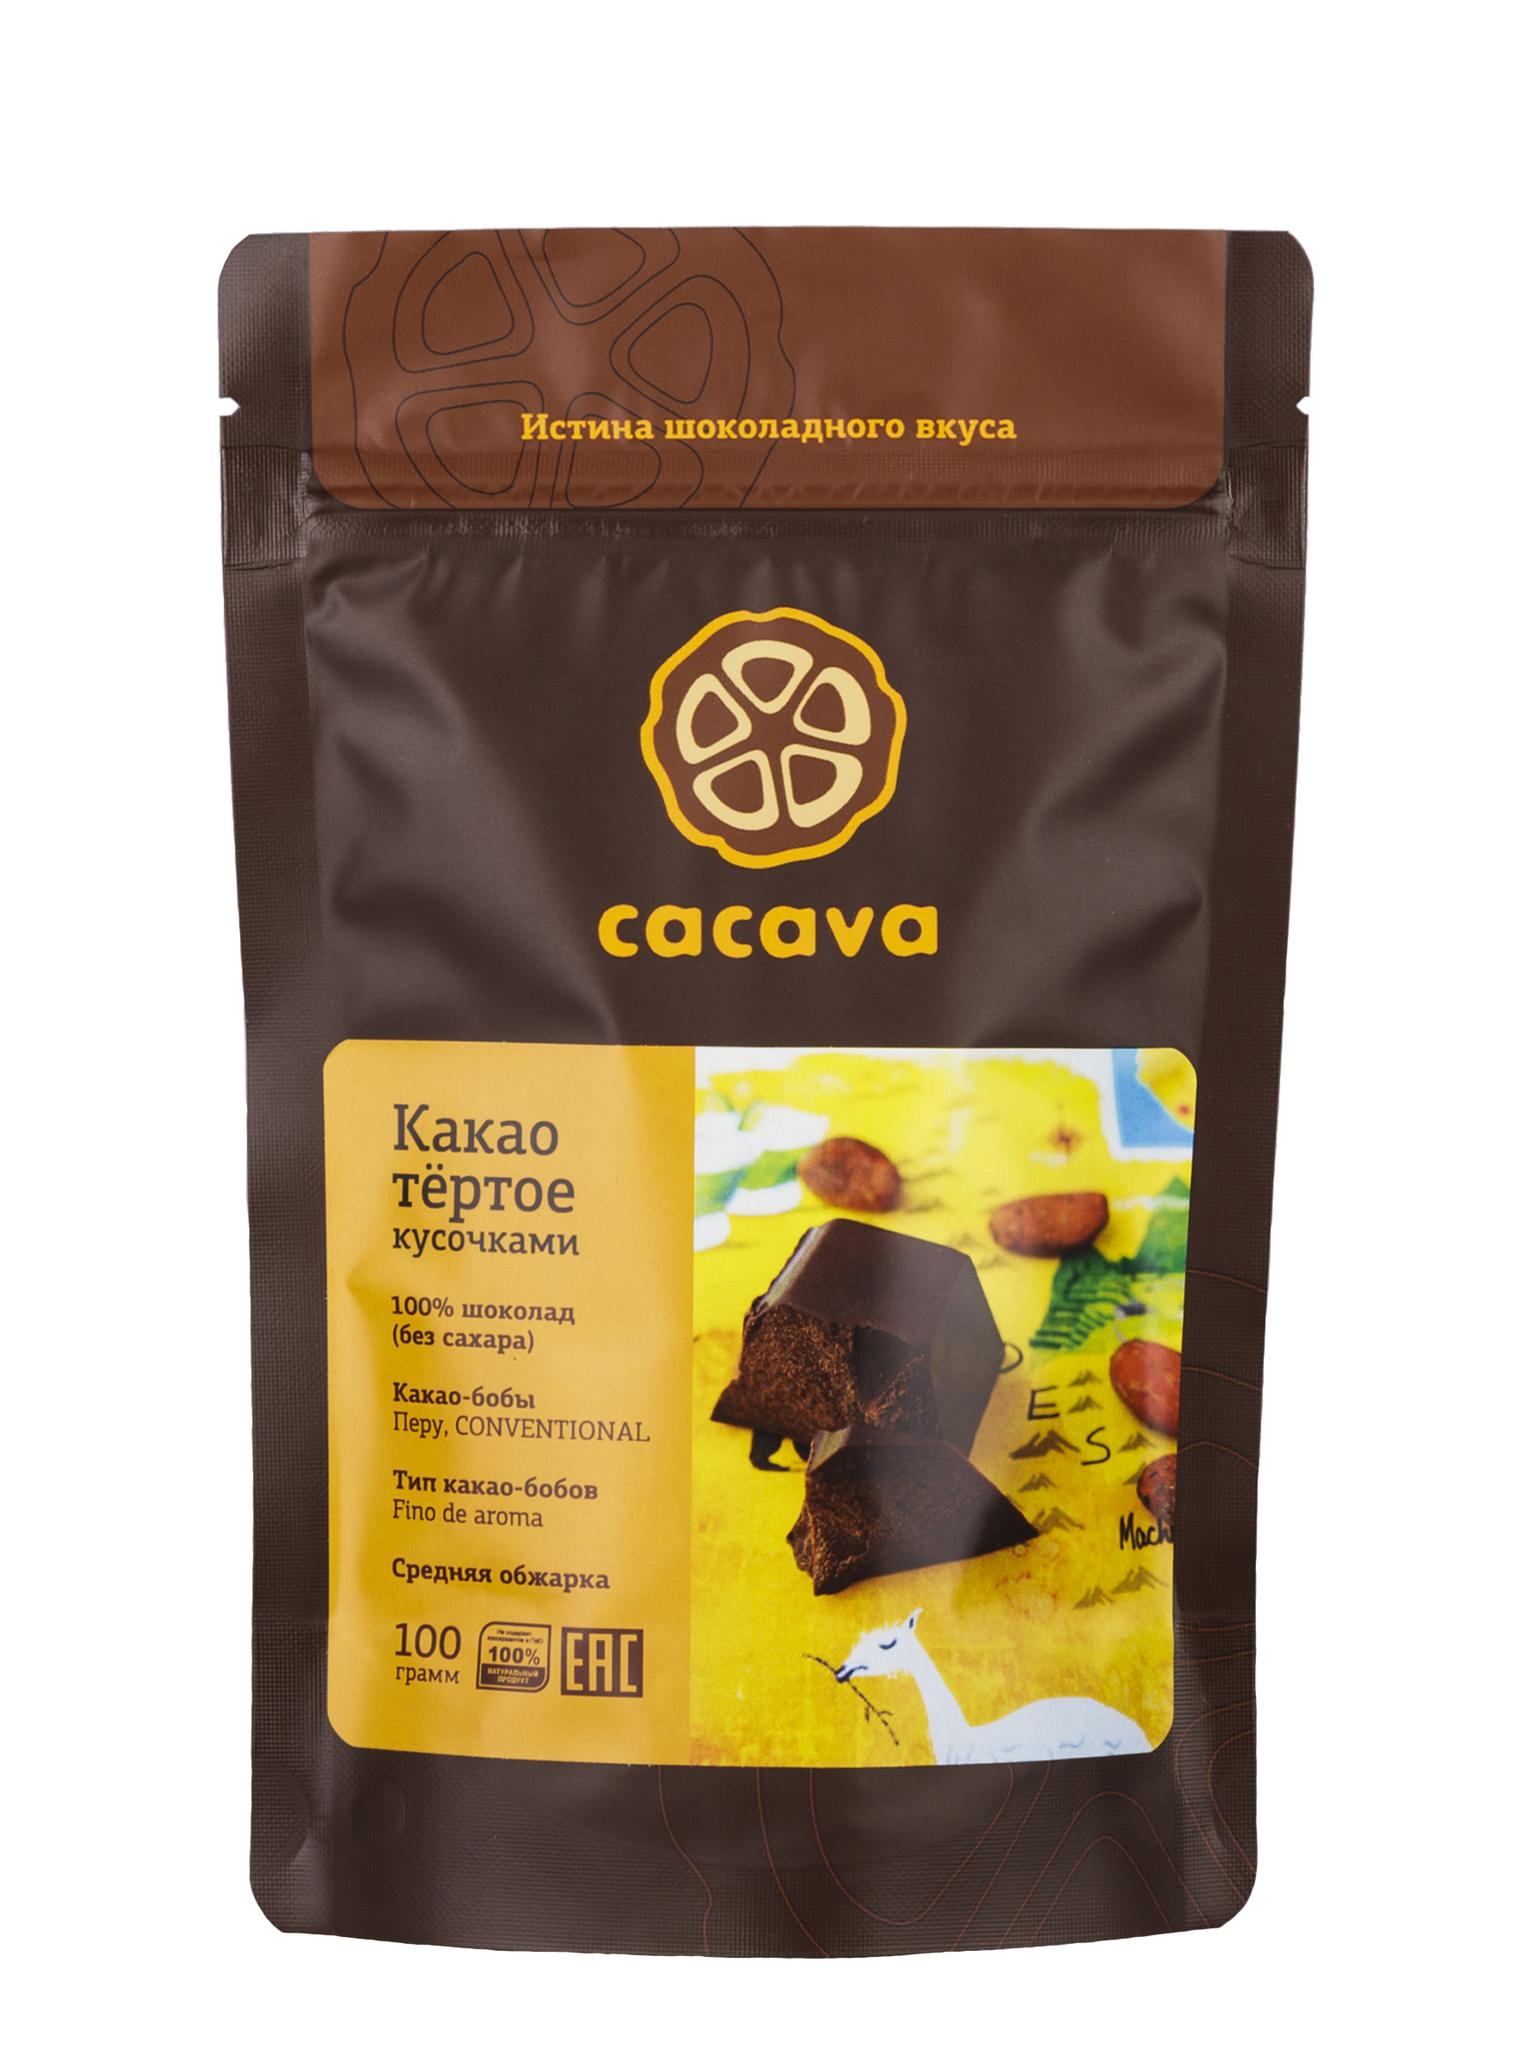 Какао тёртое кусочками (Перу), упаковка 100 грамм